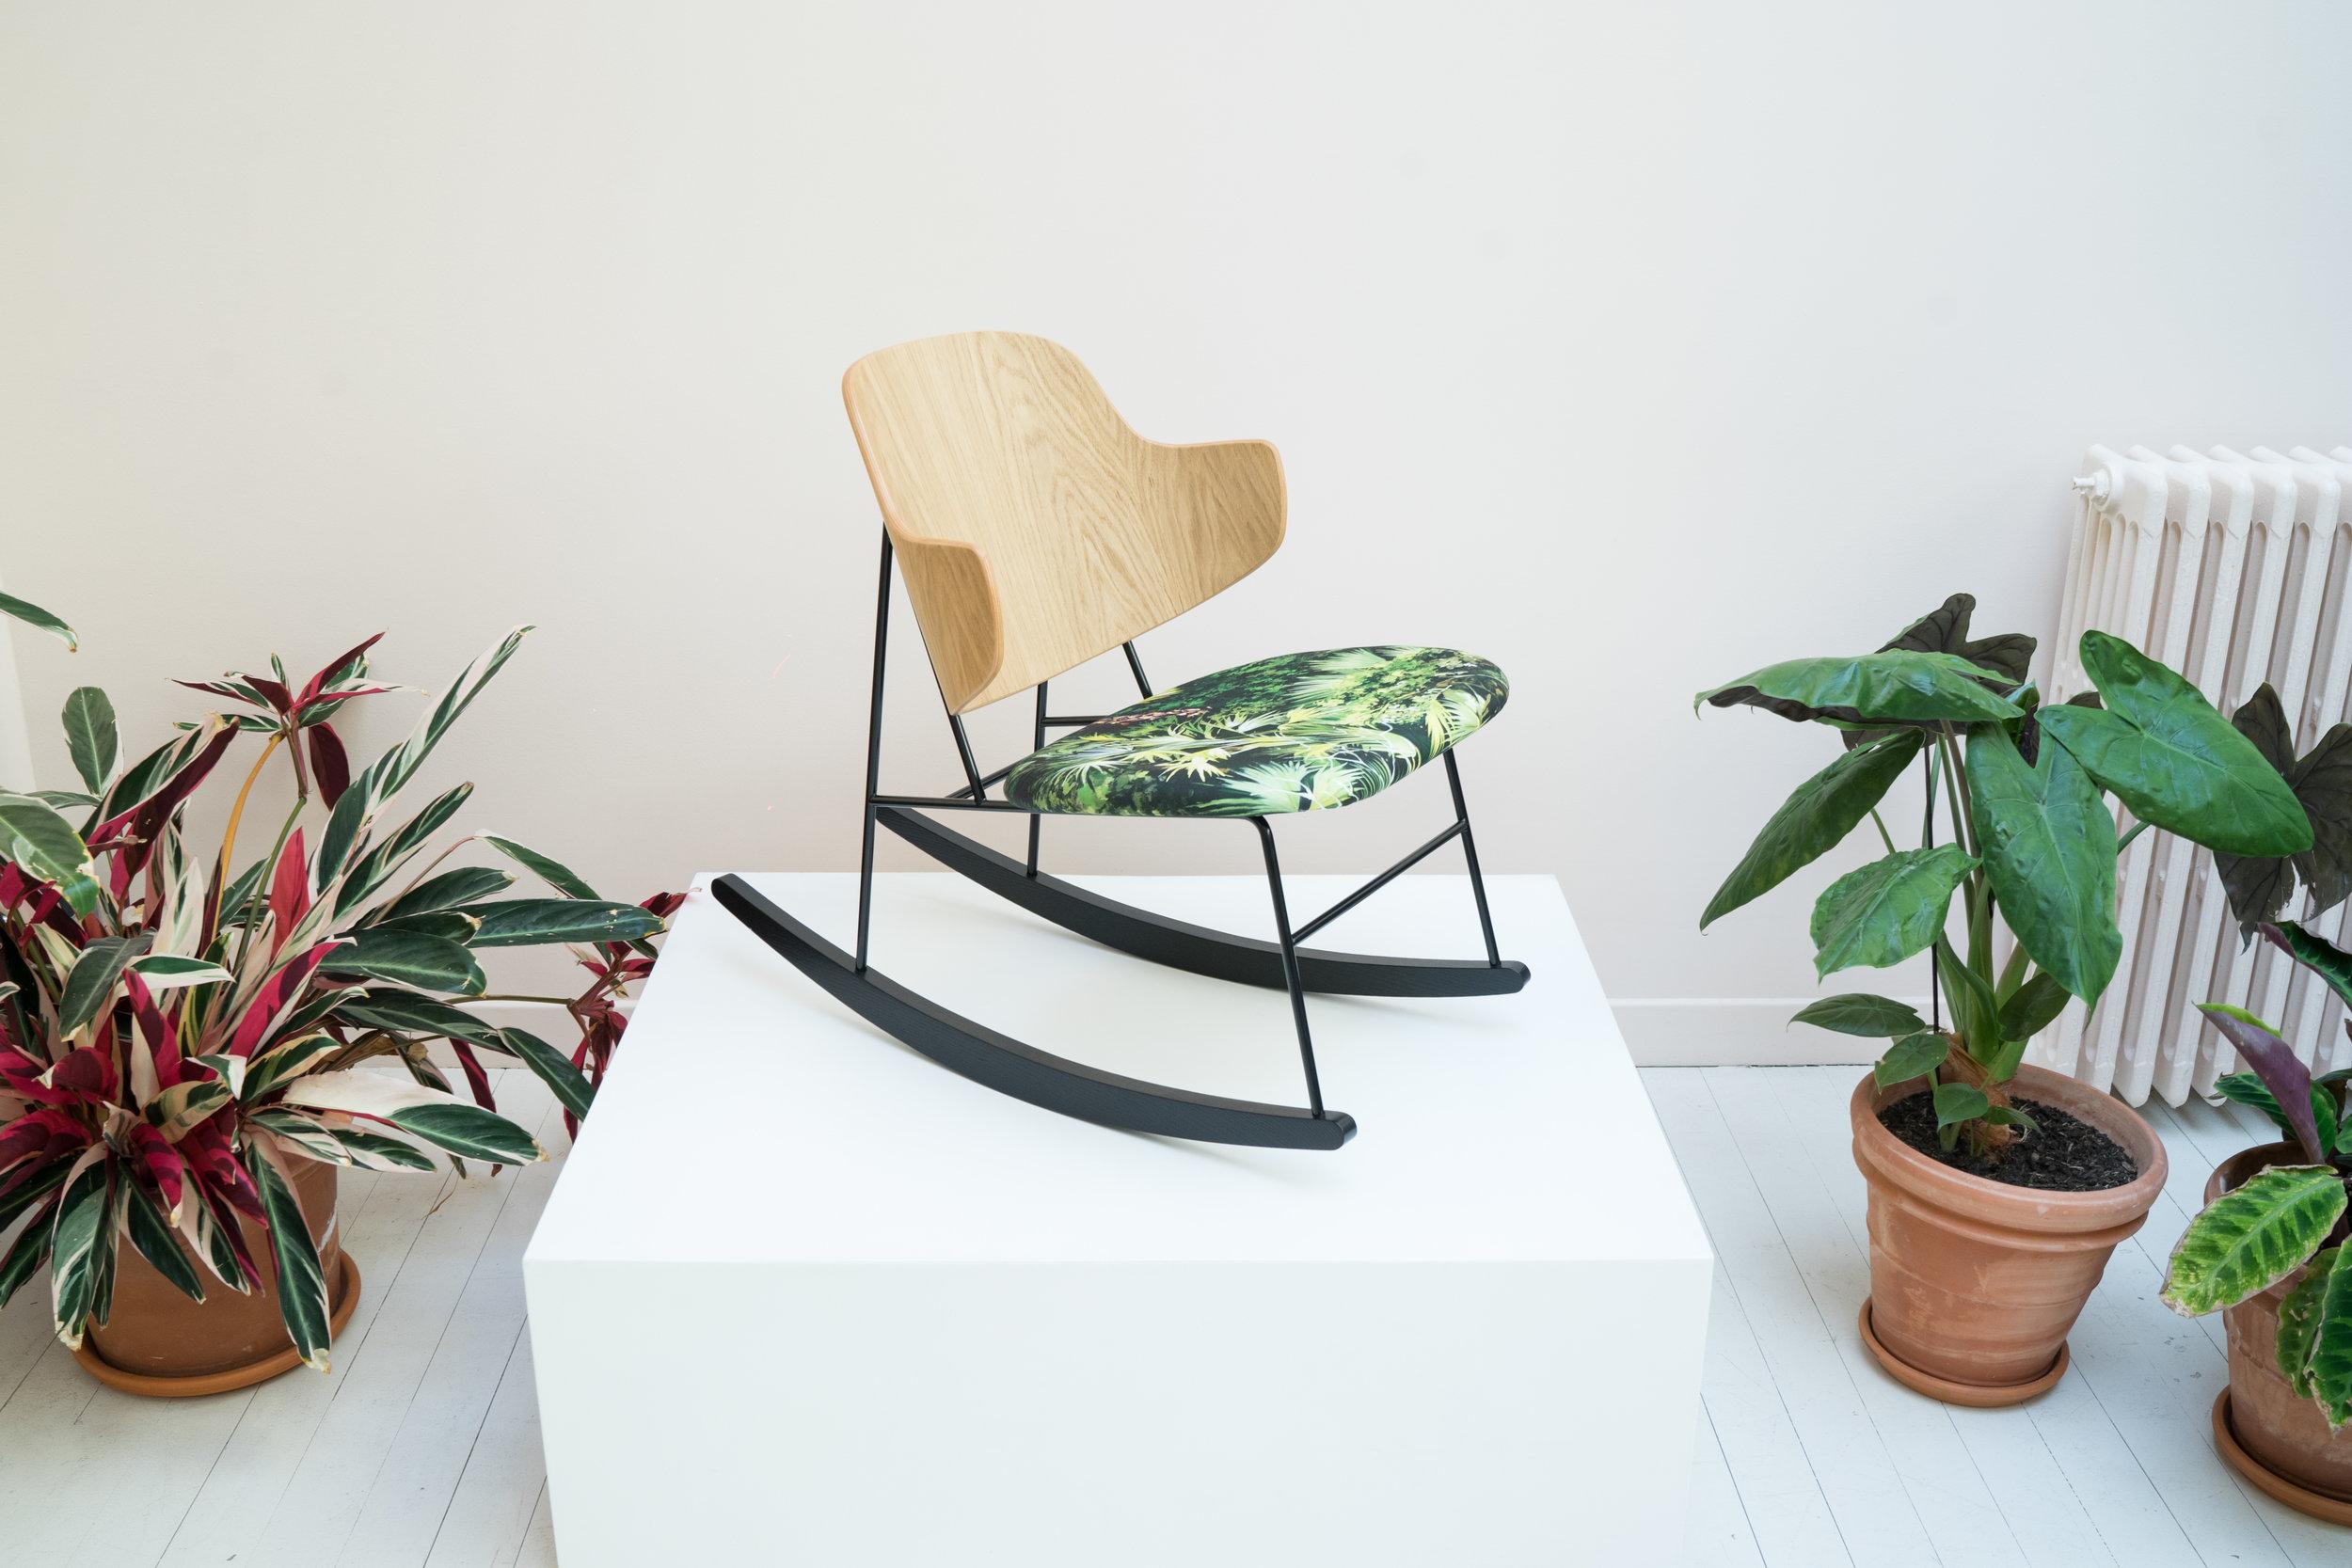 Ib Kofod Larsen,  Penguin  rocking chair, modèle V ue d'en haut  en collaboration avec Pierre Frey. Sélection Gilbert Kann,